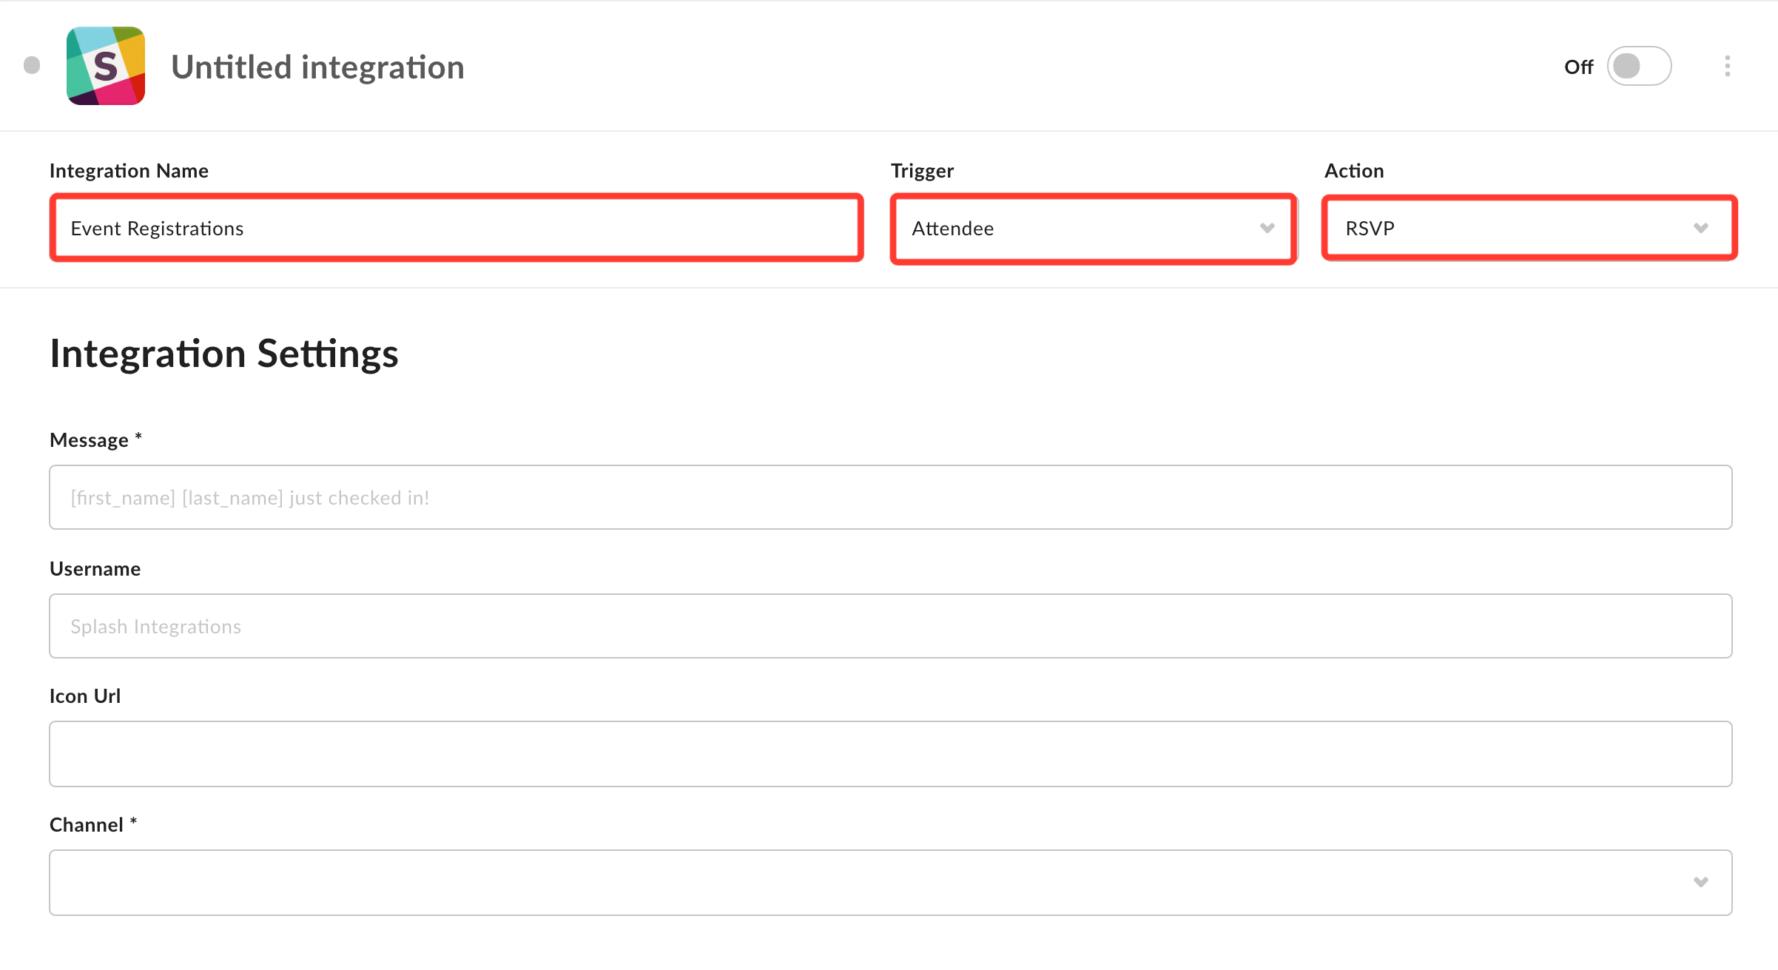 Event Ticket Sales Spreadsheet For How Do I Post Splash Updates To Slack? – Splash Help Center